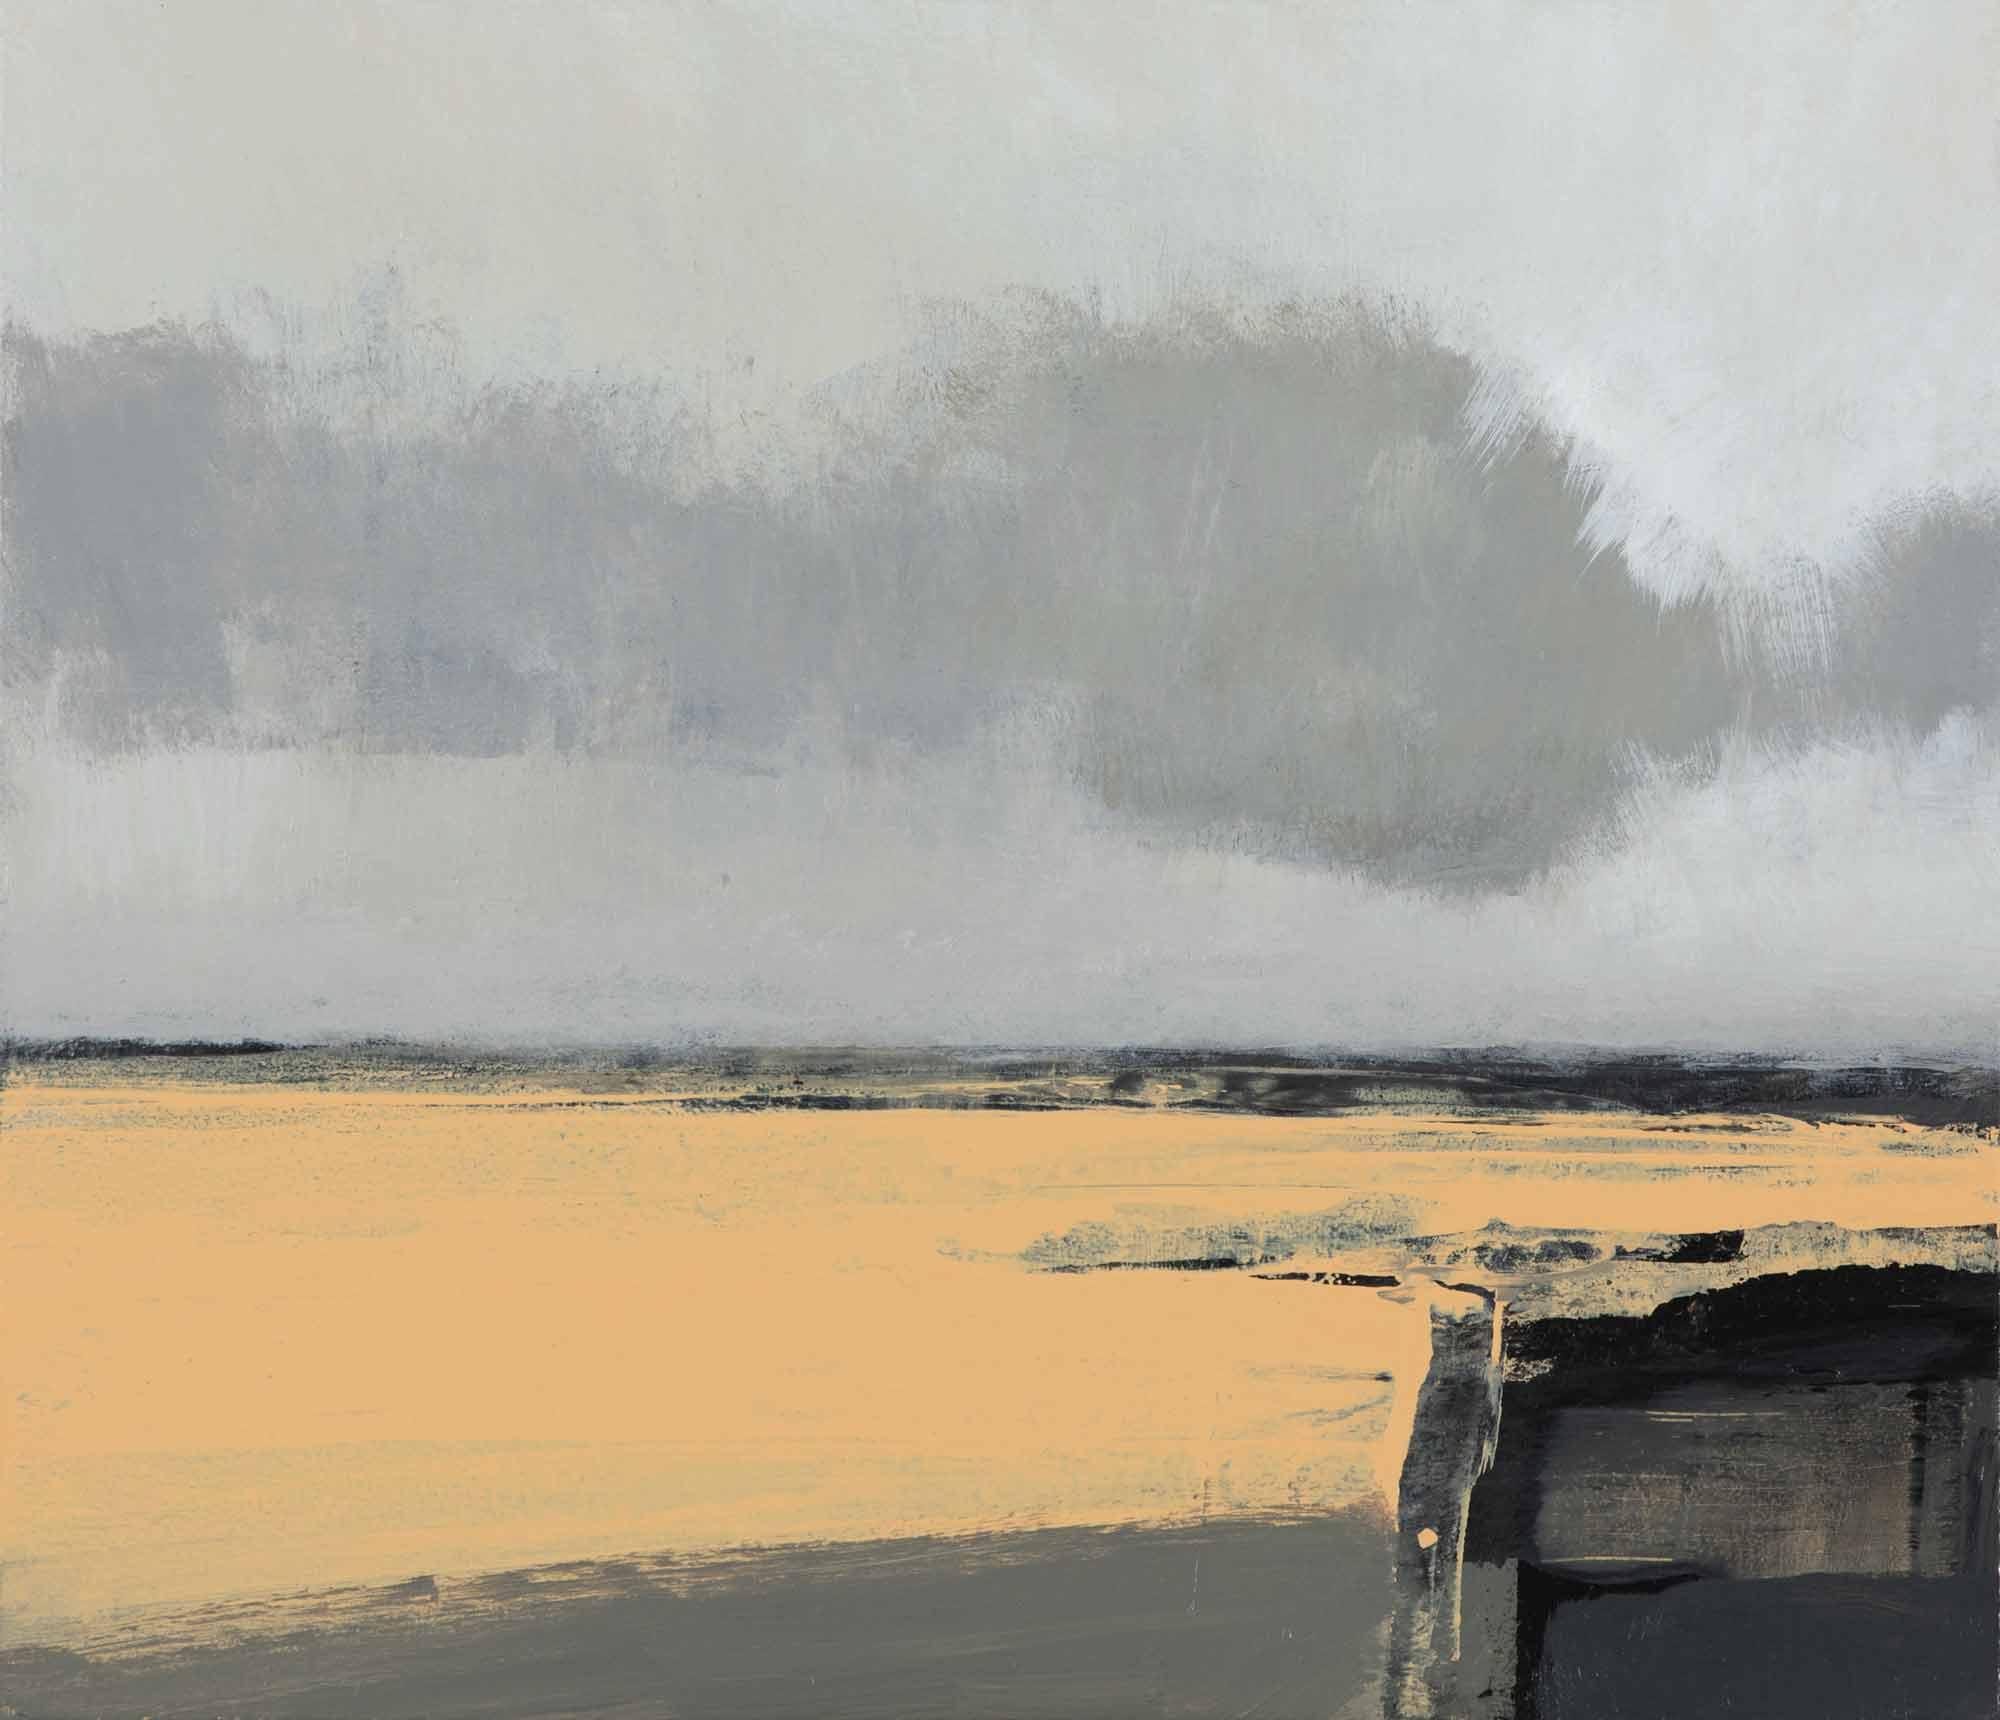 https://neilcanning.com/wp-content/uploads/sites/3/2017/03/18-Landform-Fields.jpg